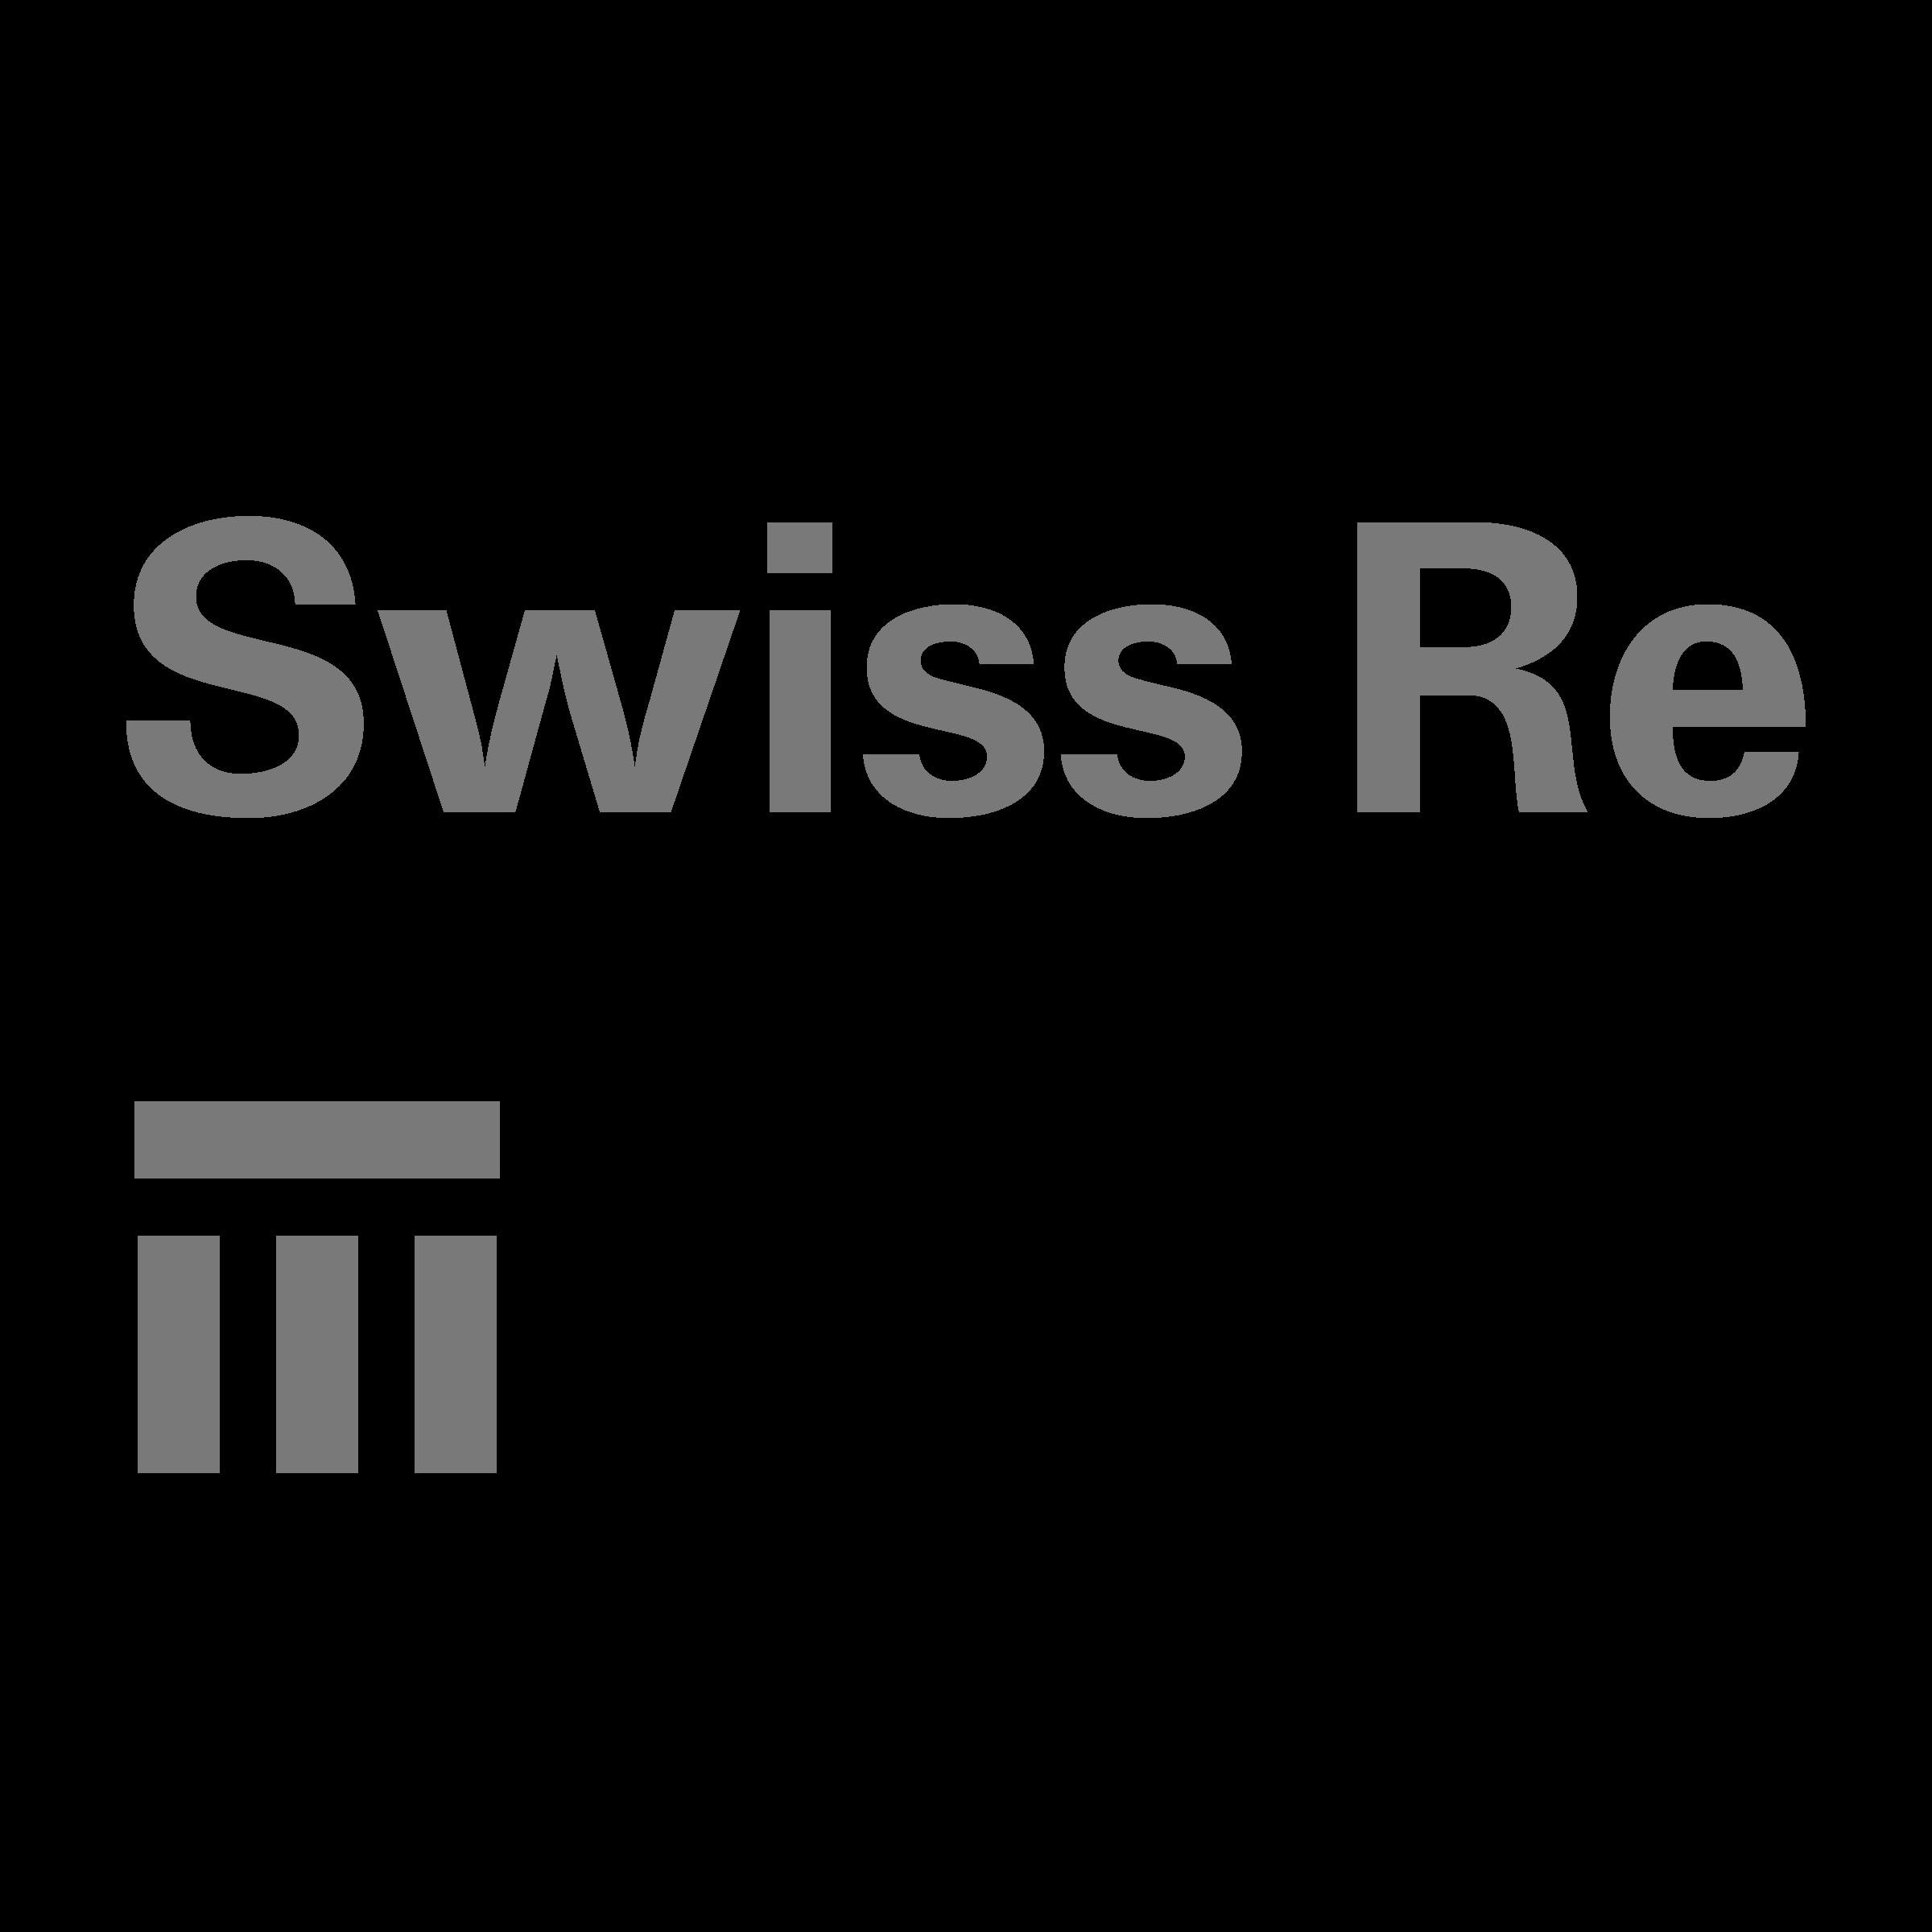 swiss-re-logo-png-transparent.png